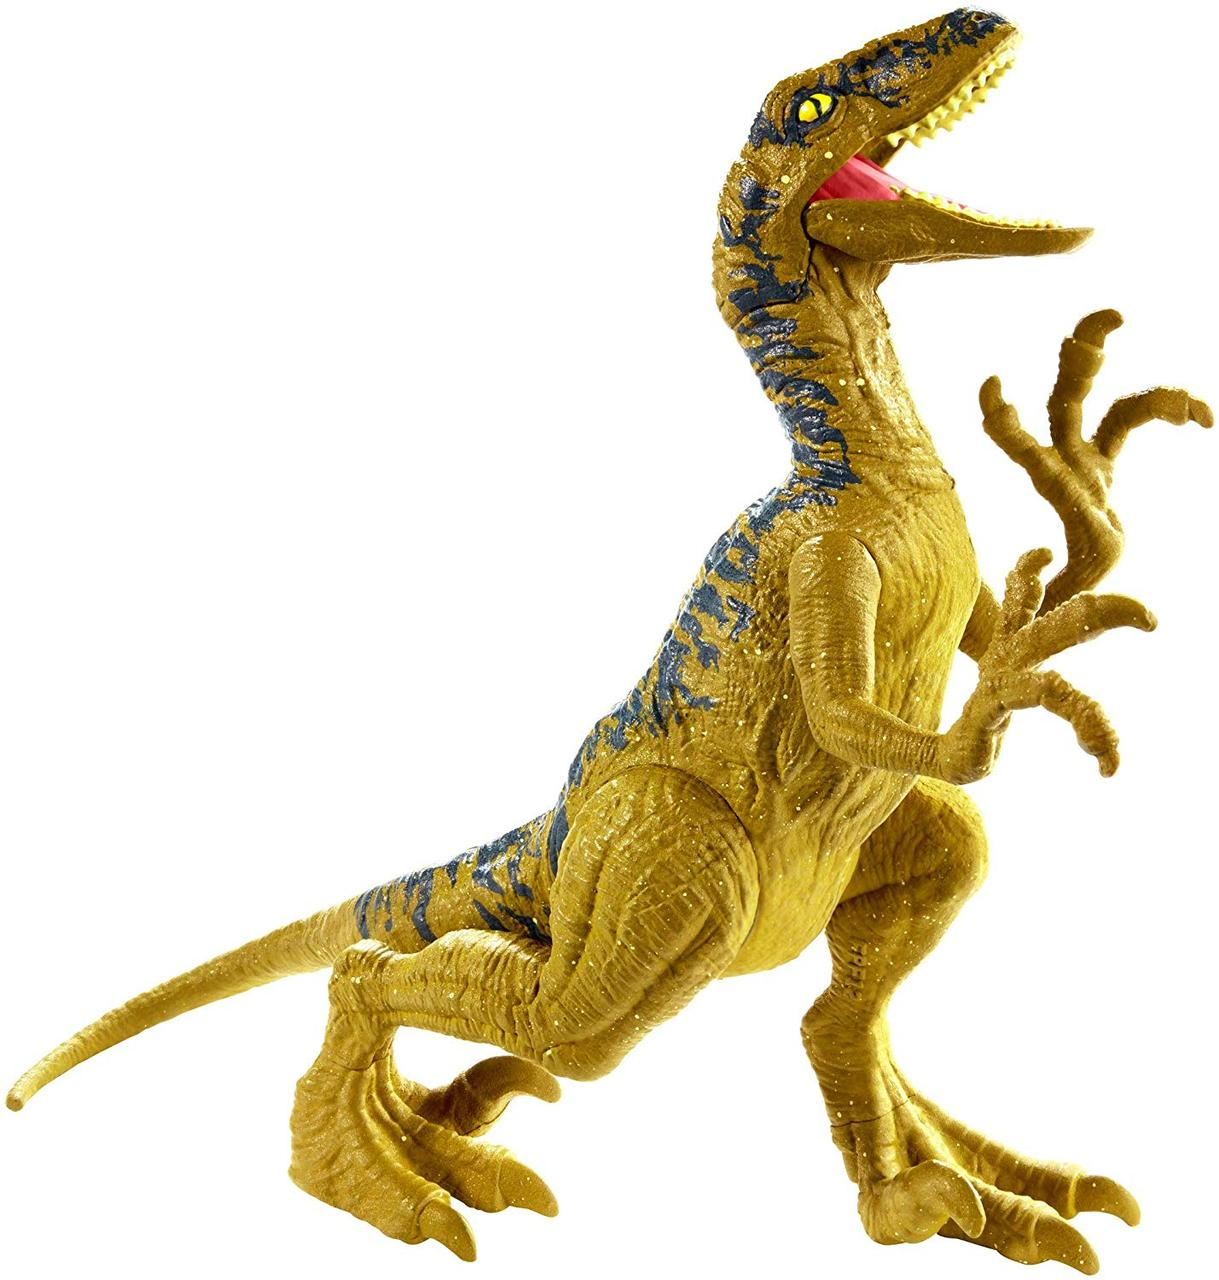 Jurassic World Велоцираптор дельта